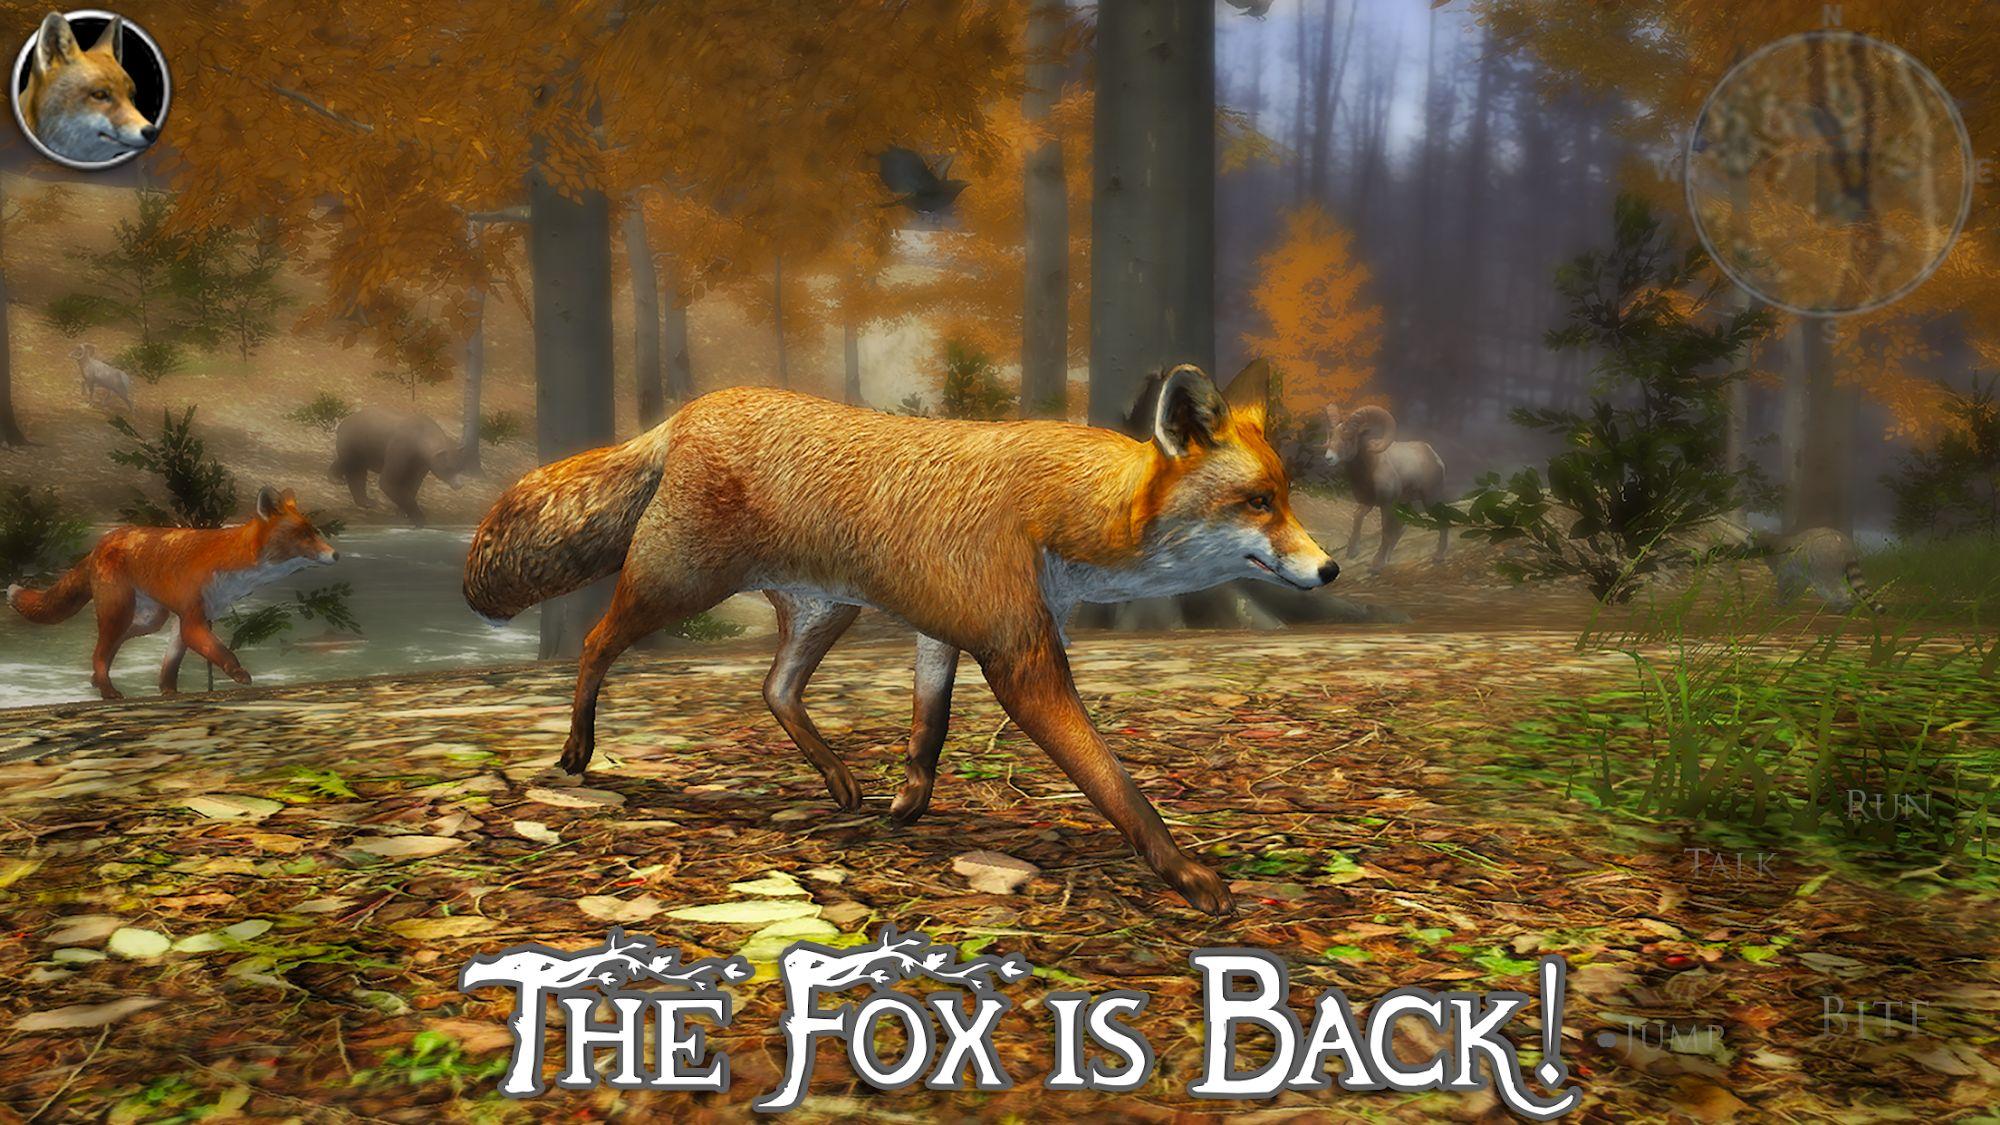 Ultimate Fox Simulator 2 captura de pantalla 1